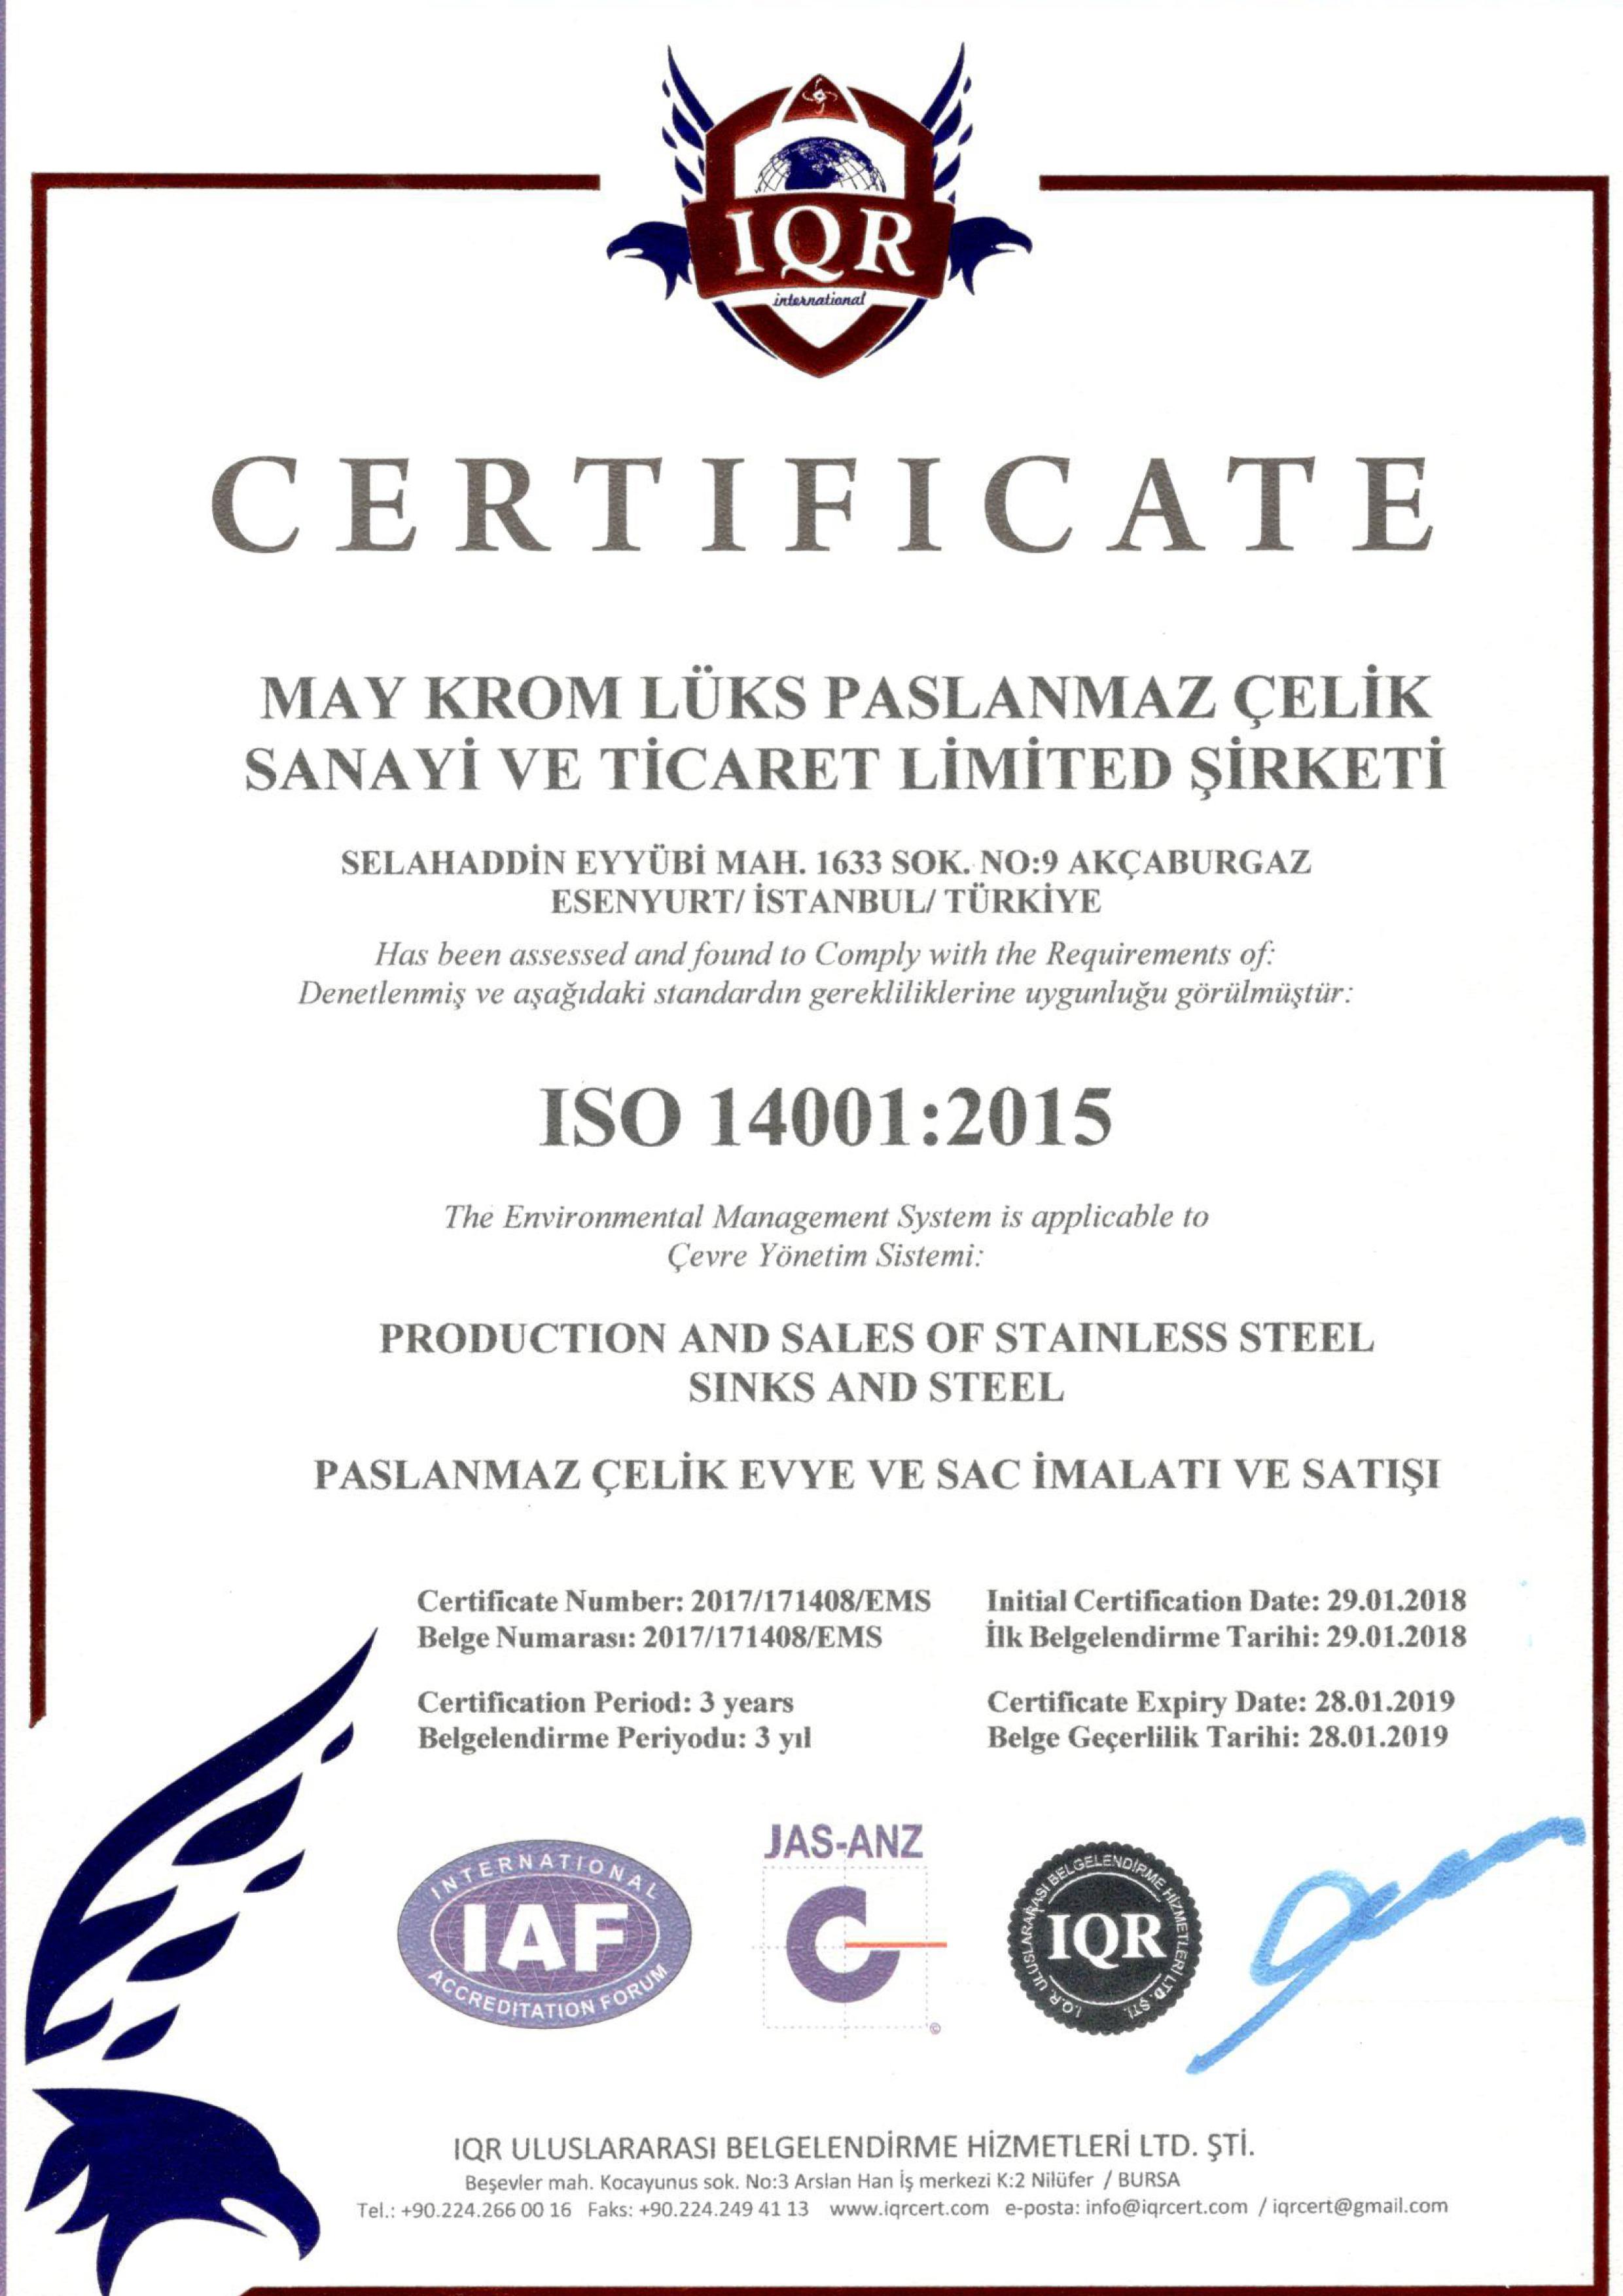 ISO 14001 - CERTIFICATES